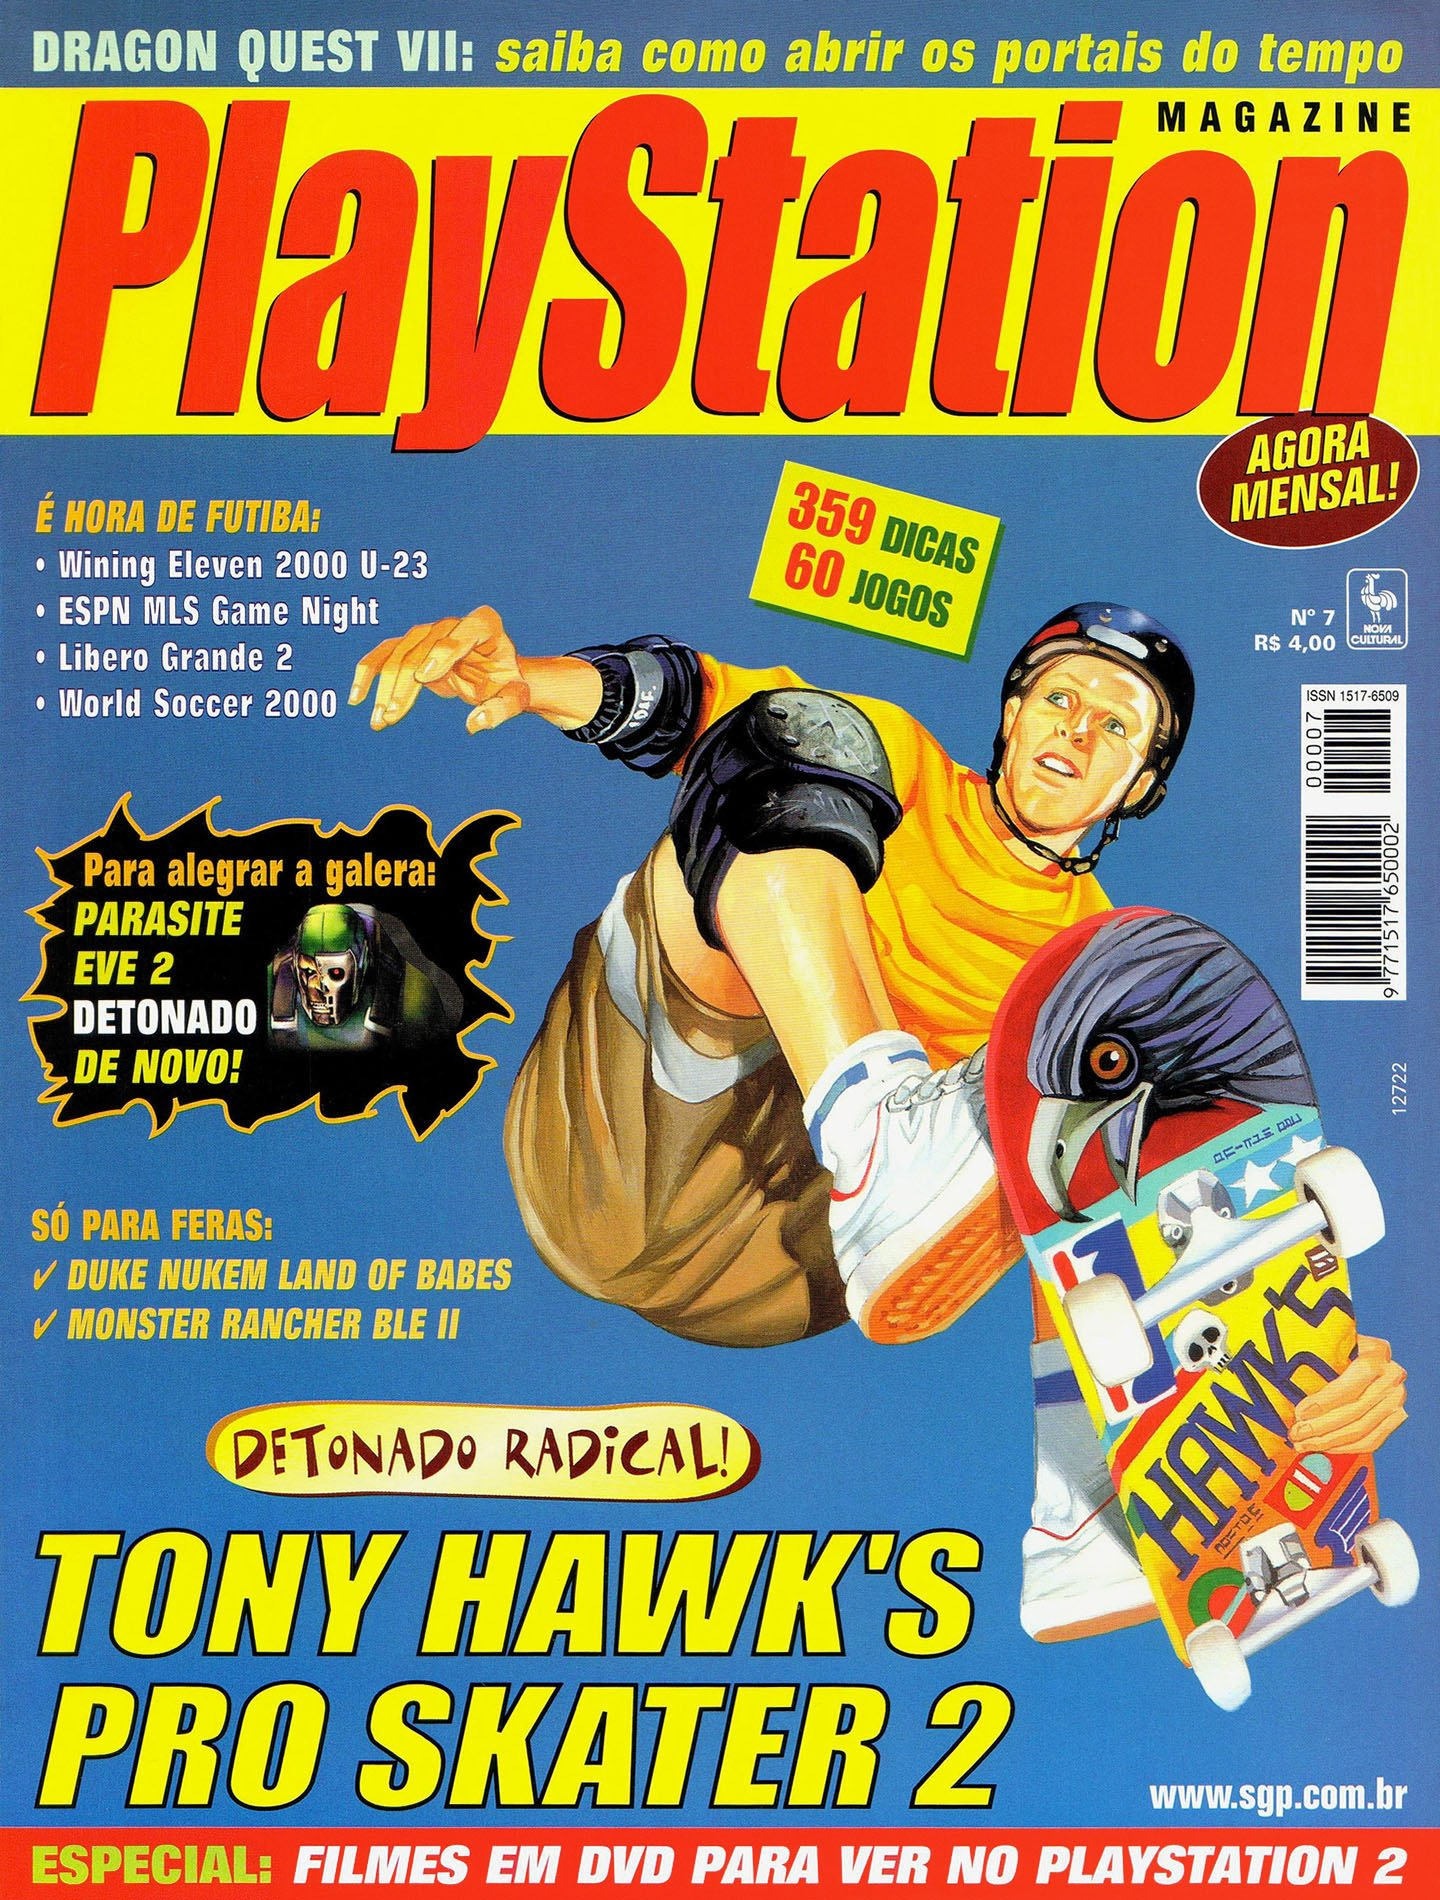 SGP Playstation Magazine Issue 07 (November 2000)